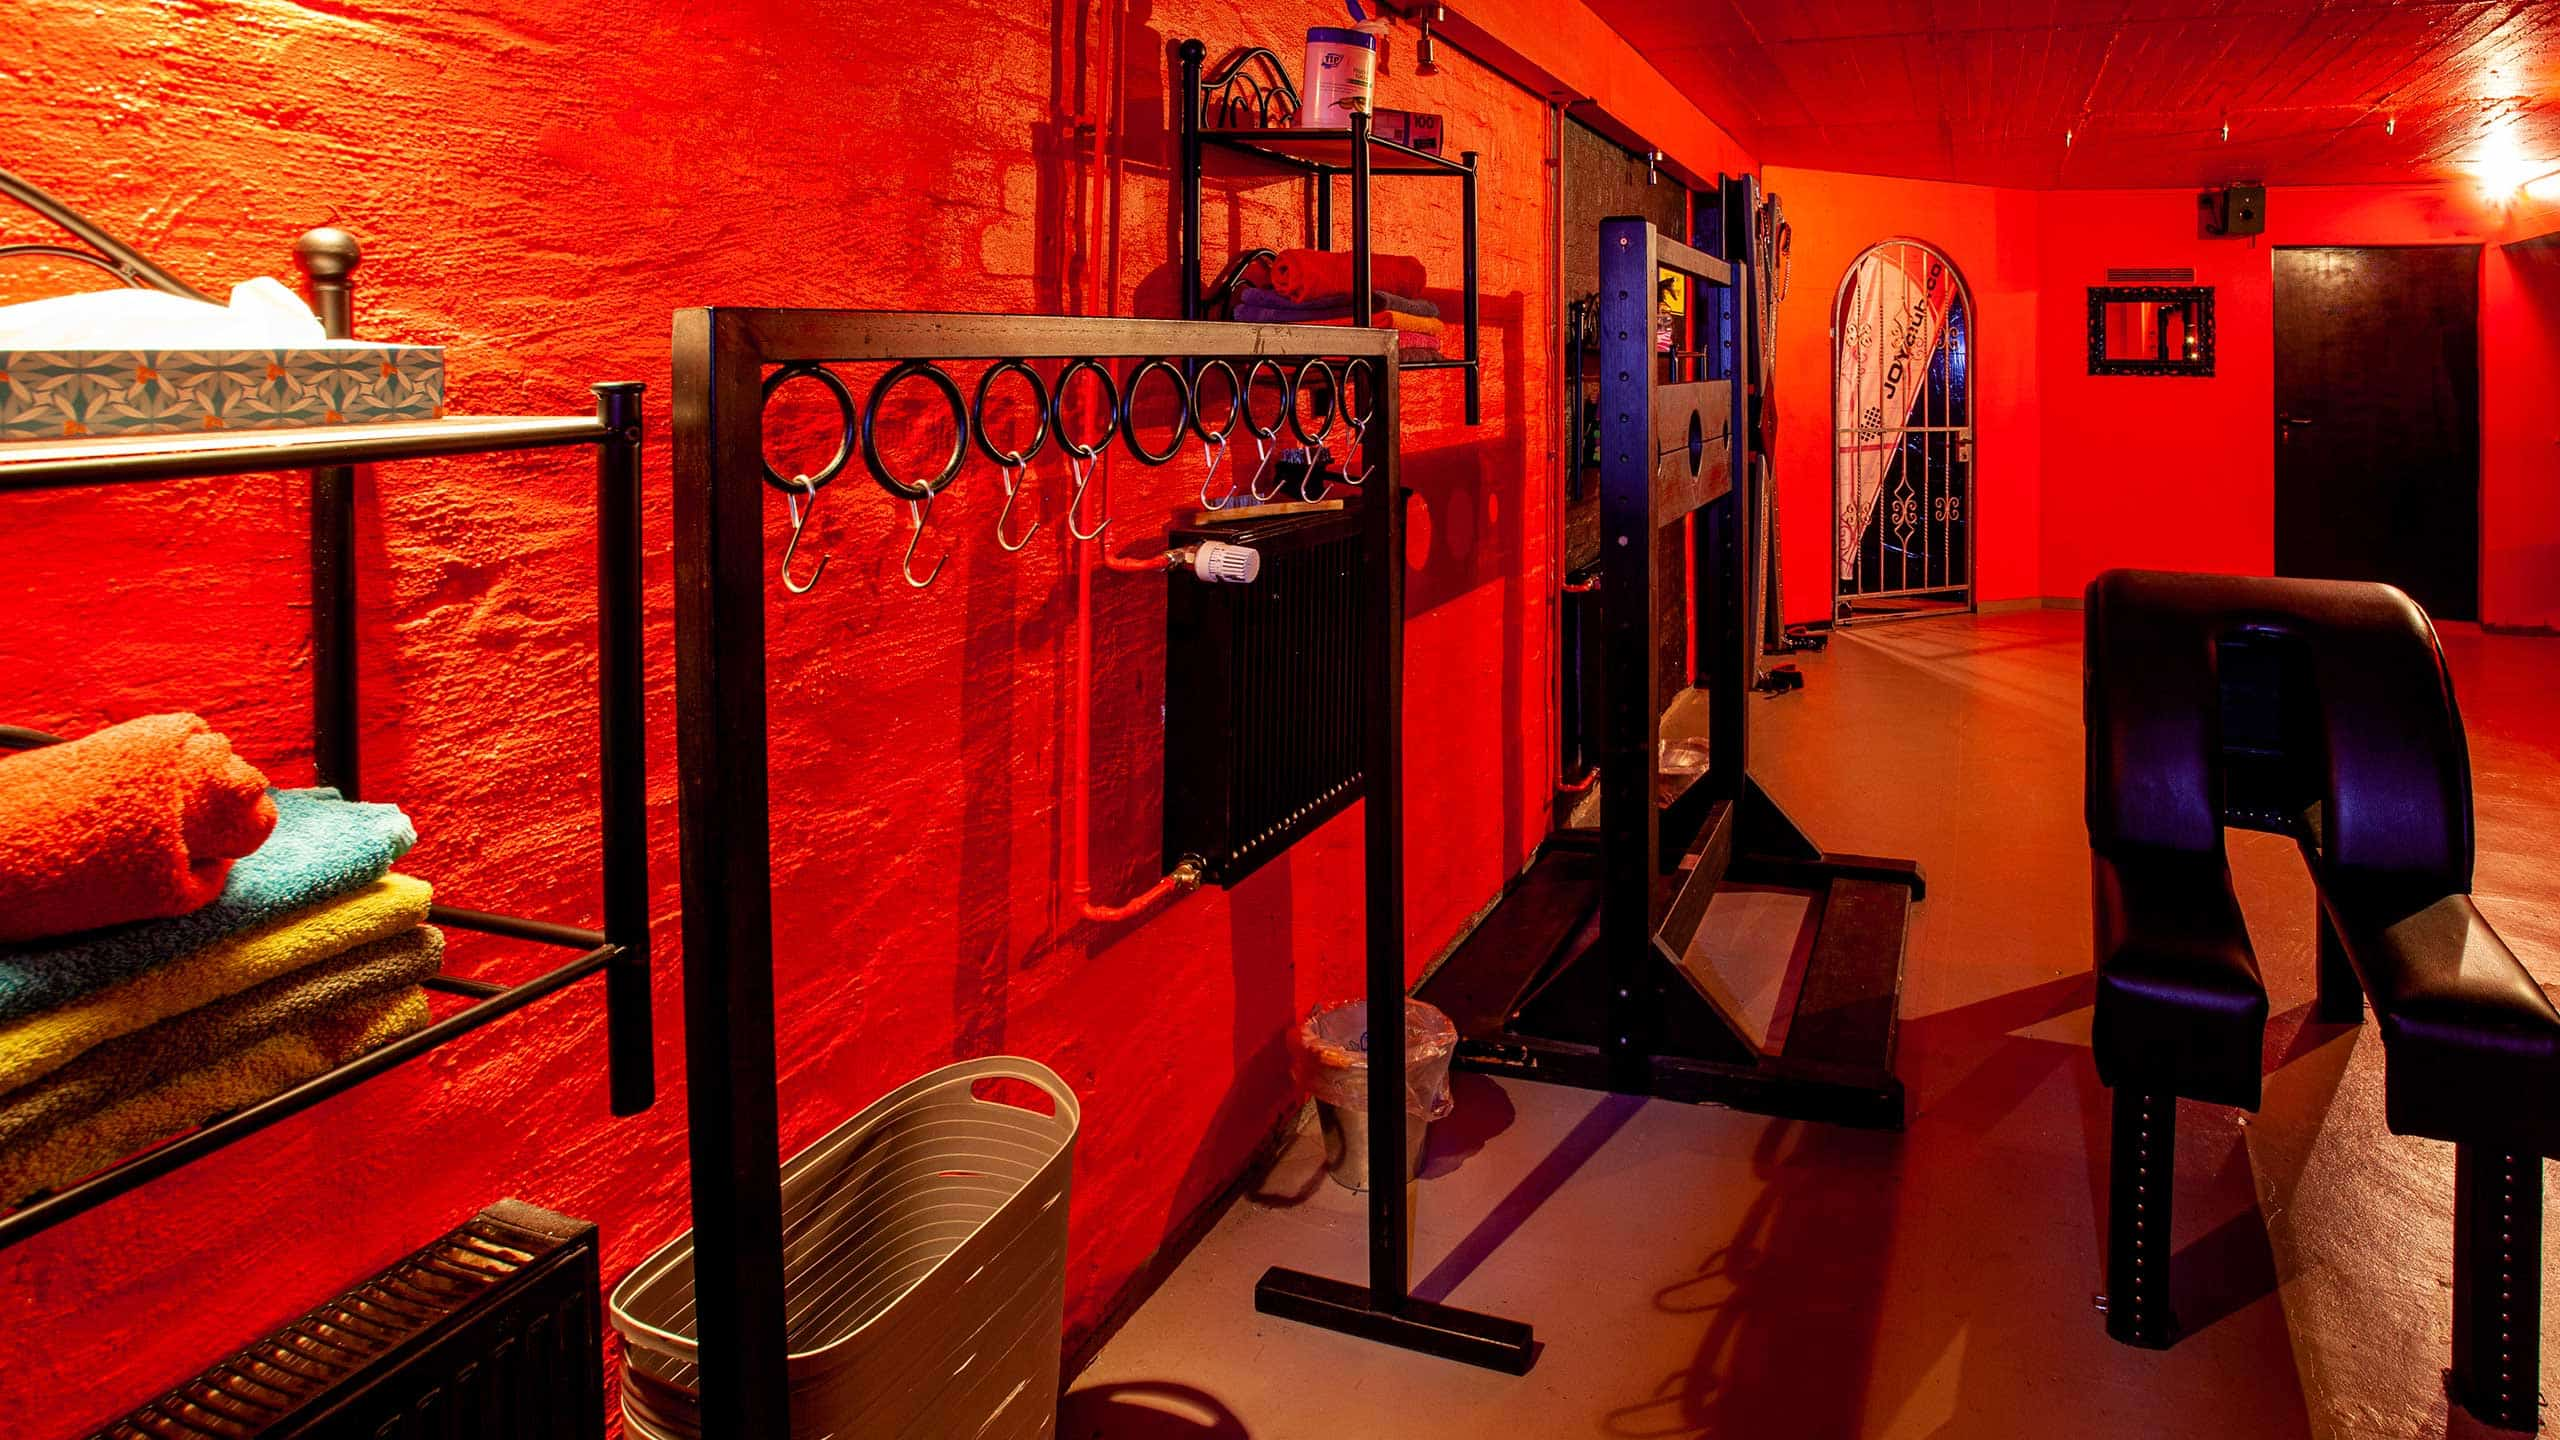 Bar Hemmungslos Hannover BDSM Keller Playroom